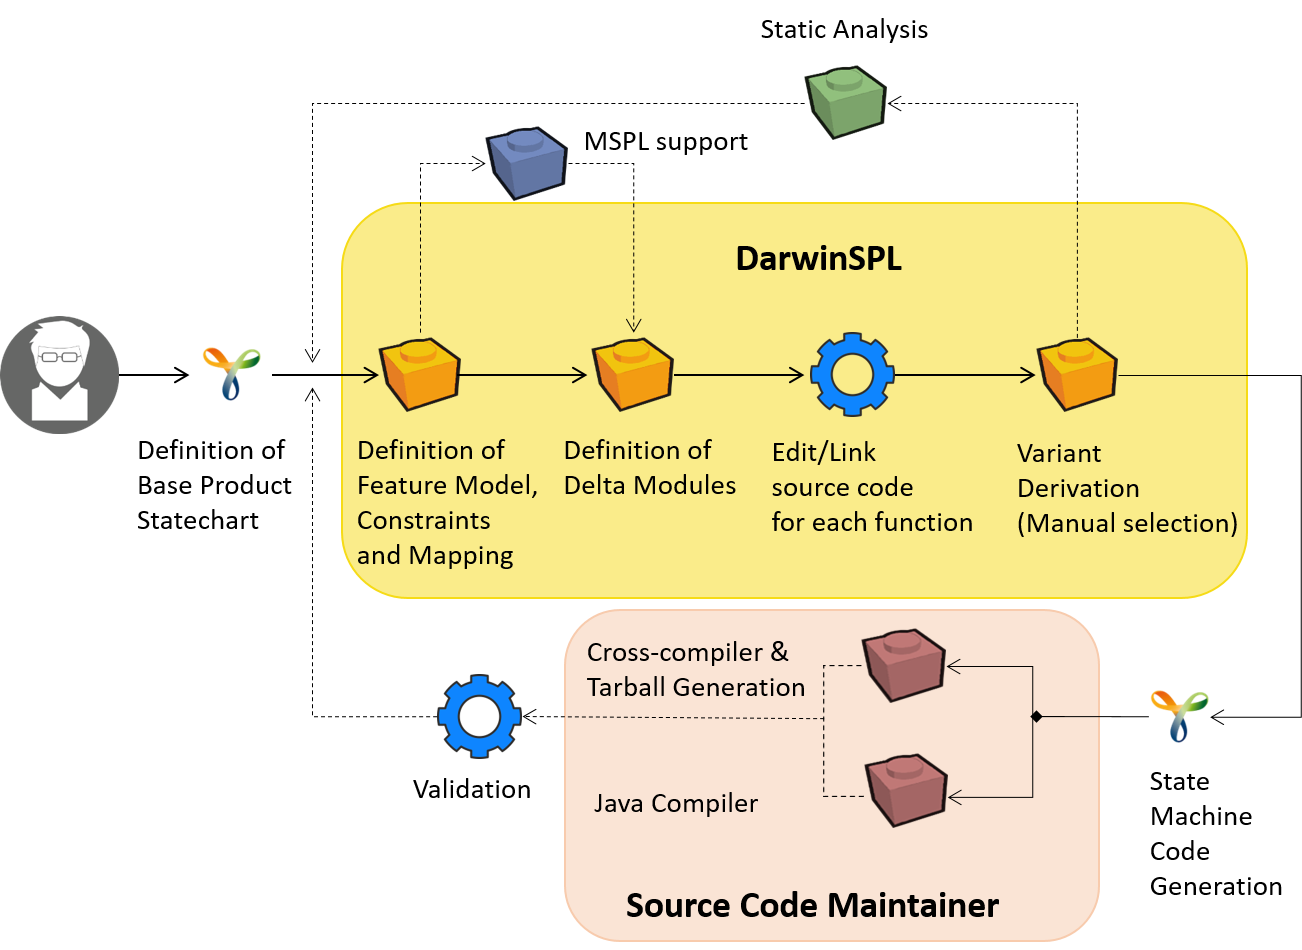 DevelopmentView.png